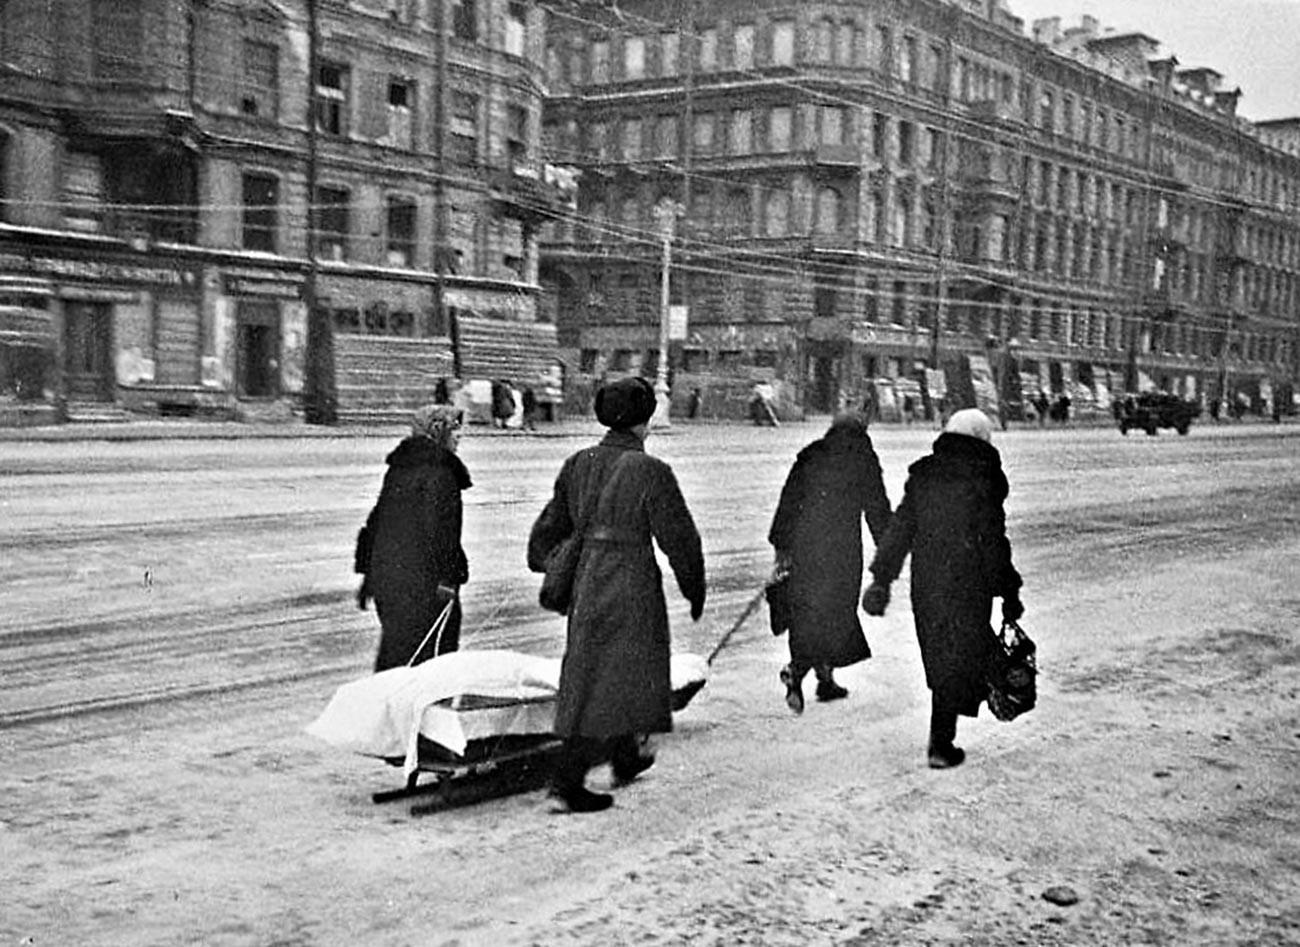 Posmrtna povorka u opsjednutom Lenjingradu. Nevski prospekt.